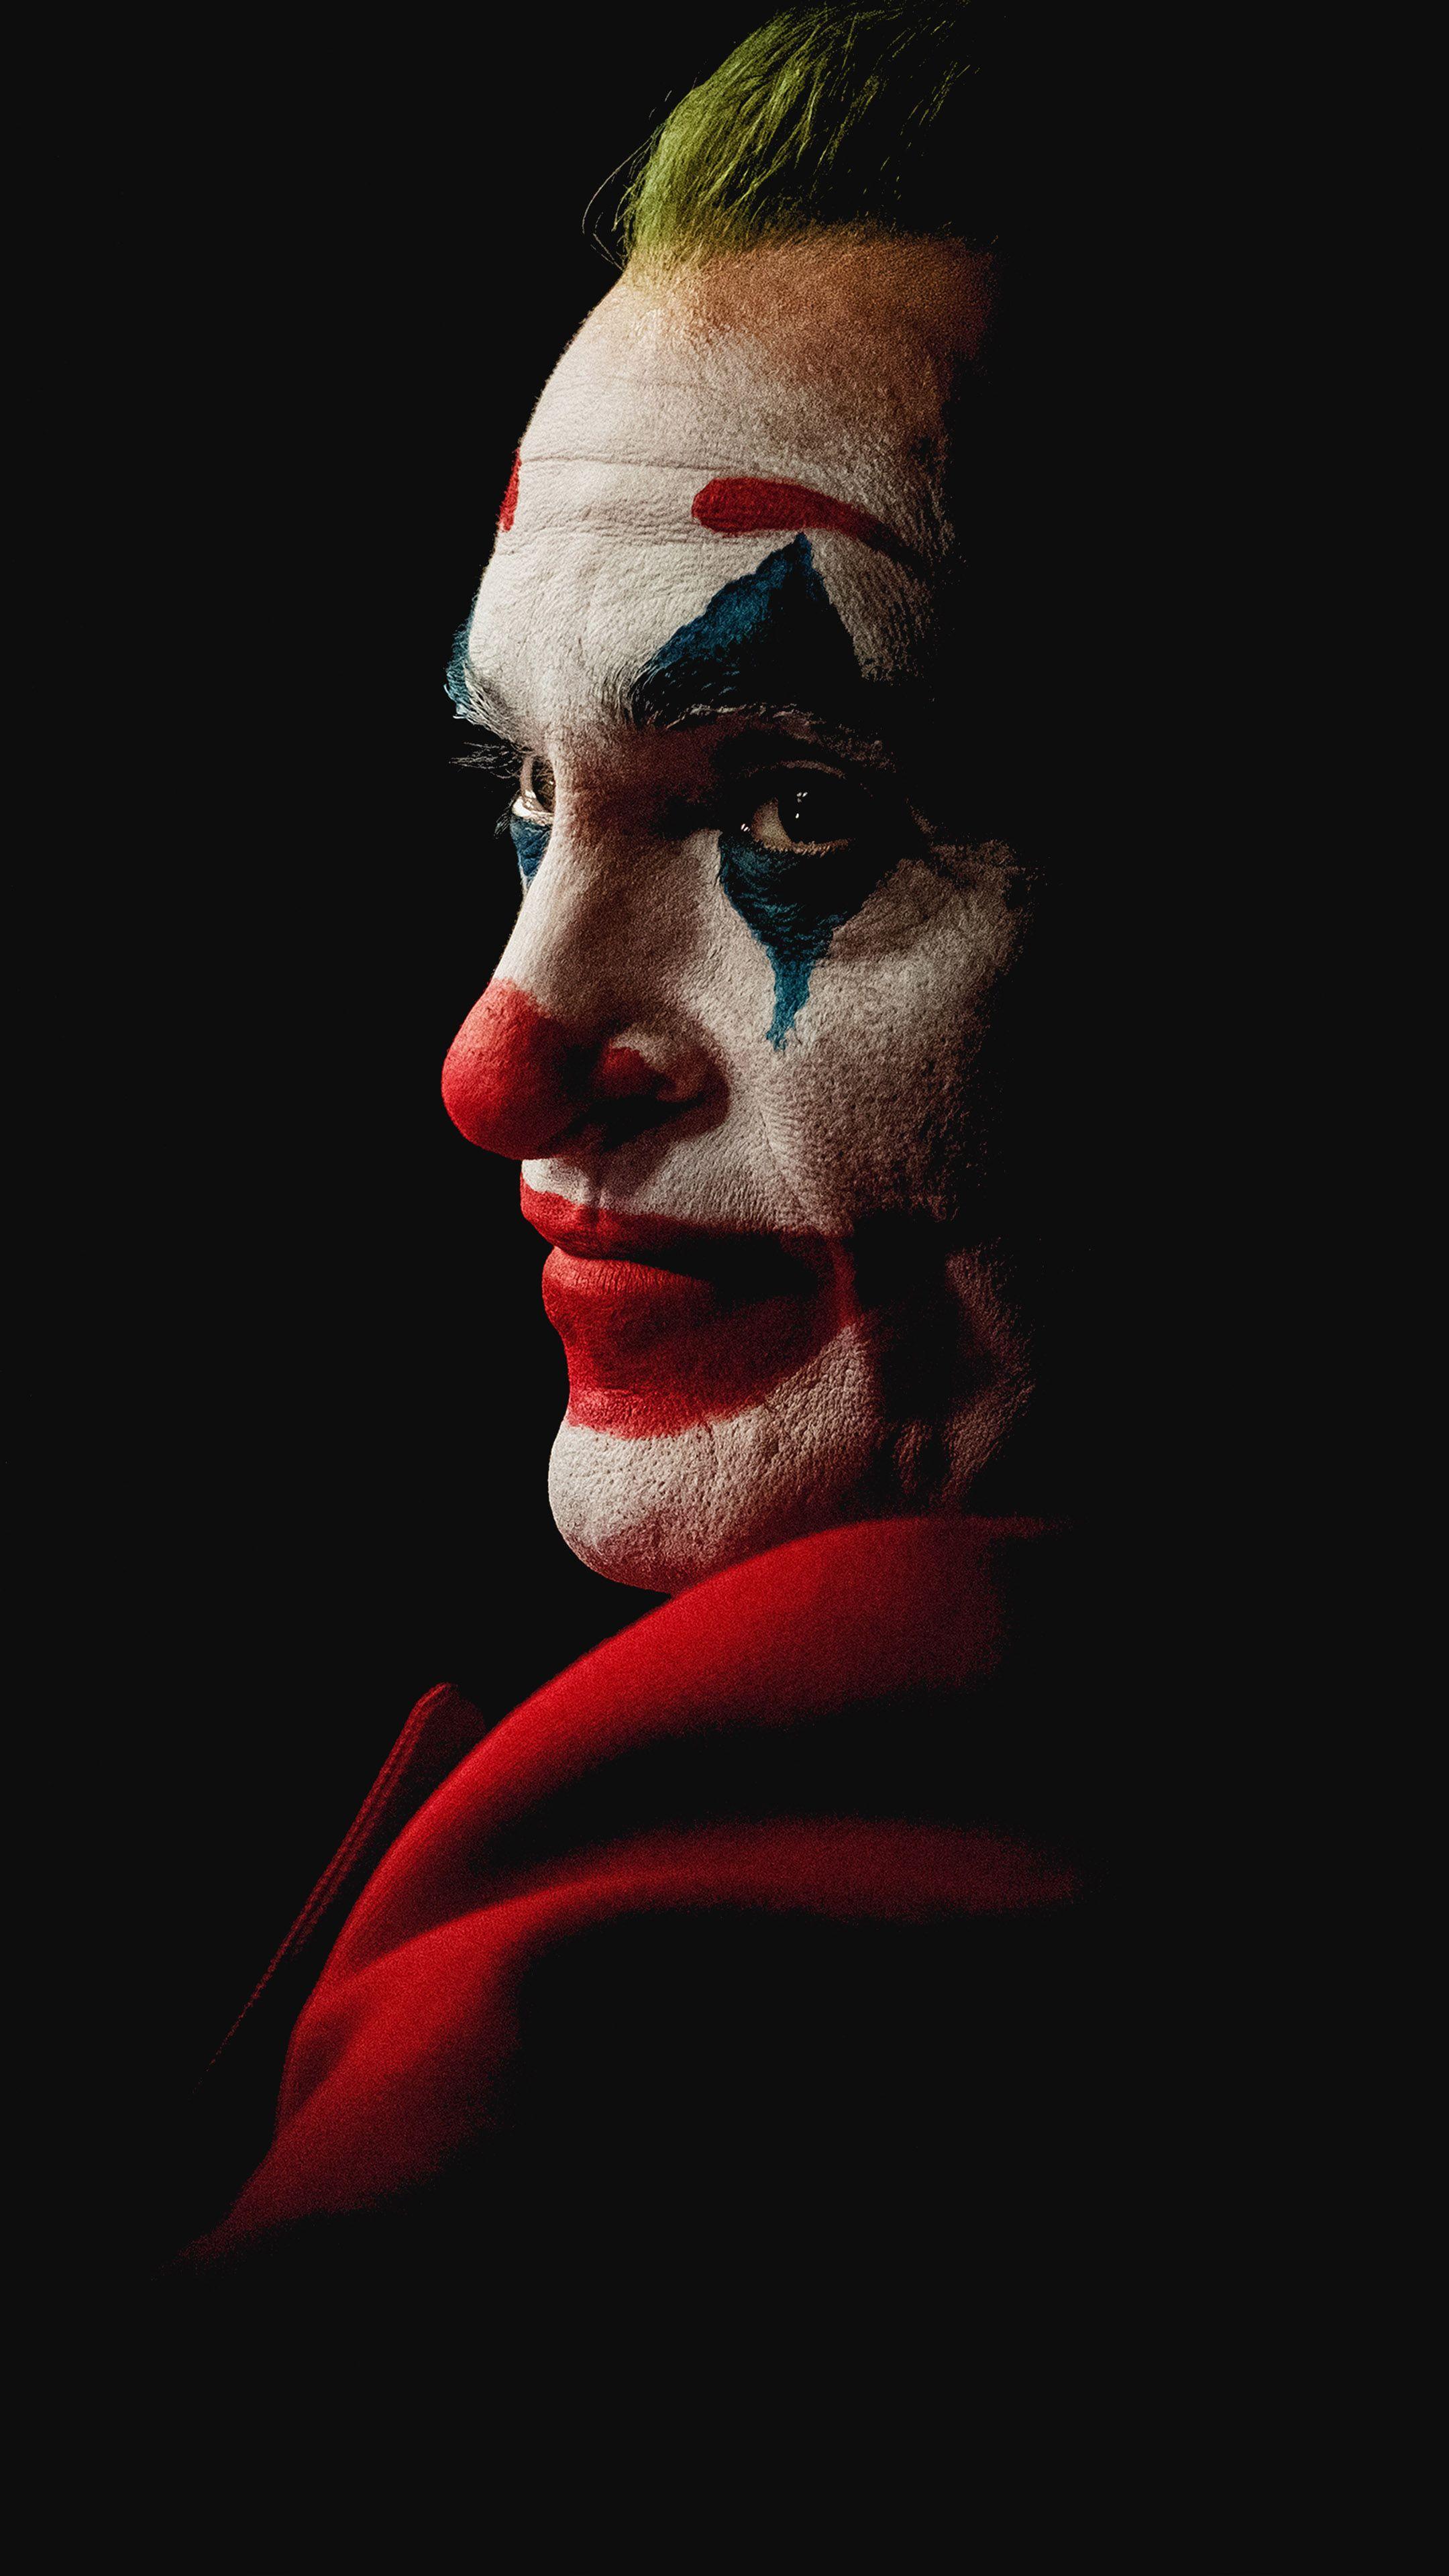 Joker Hd Images Wallpaper Cave